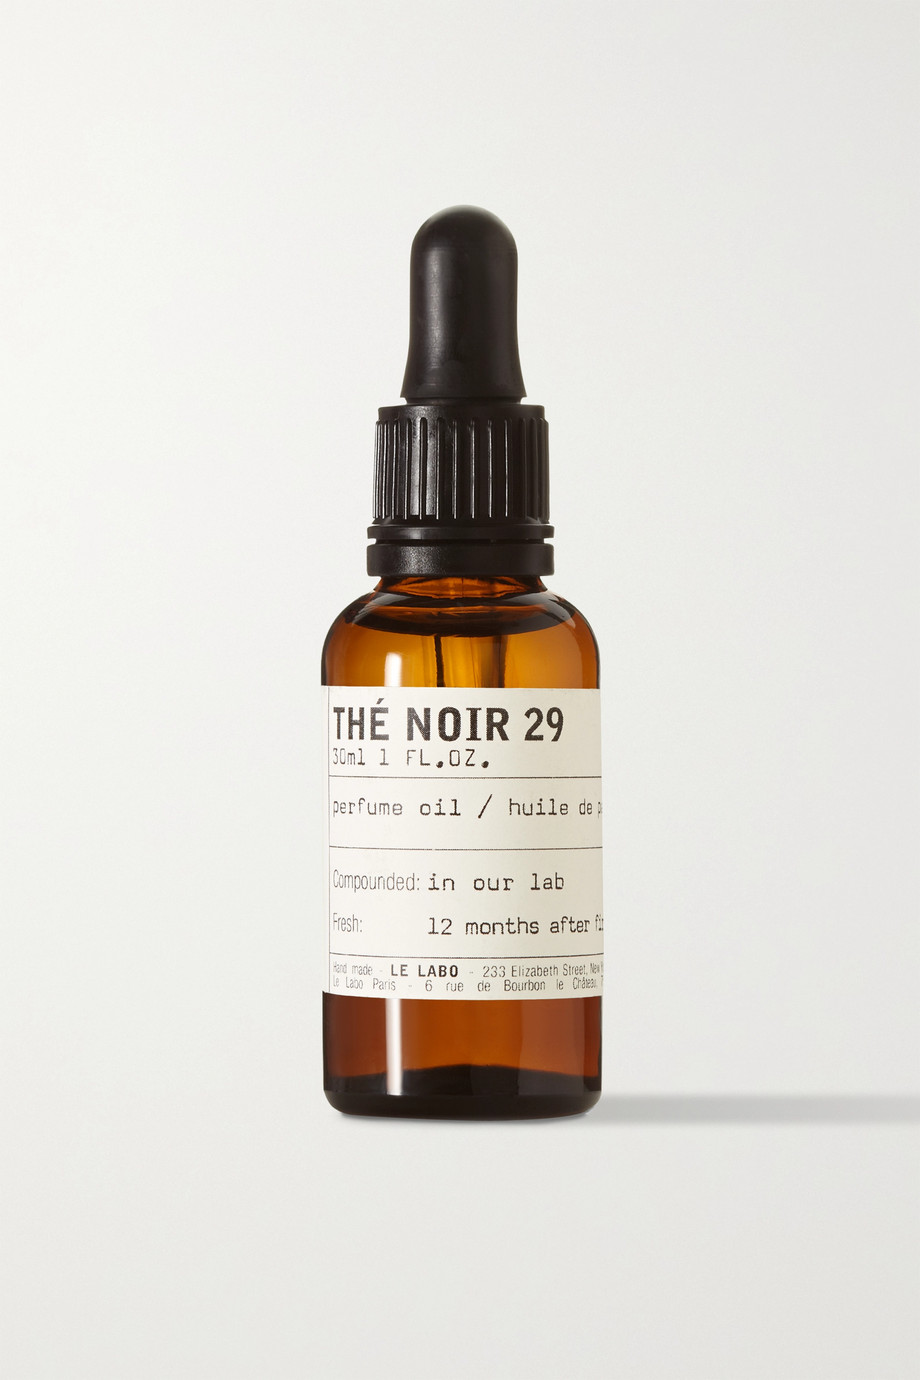 Le Labo Thé Noir 29 Perfume Oil - Black Tea Essence, 30ml